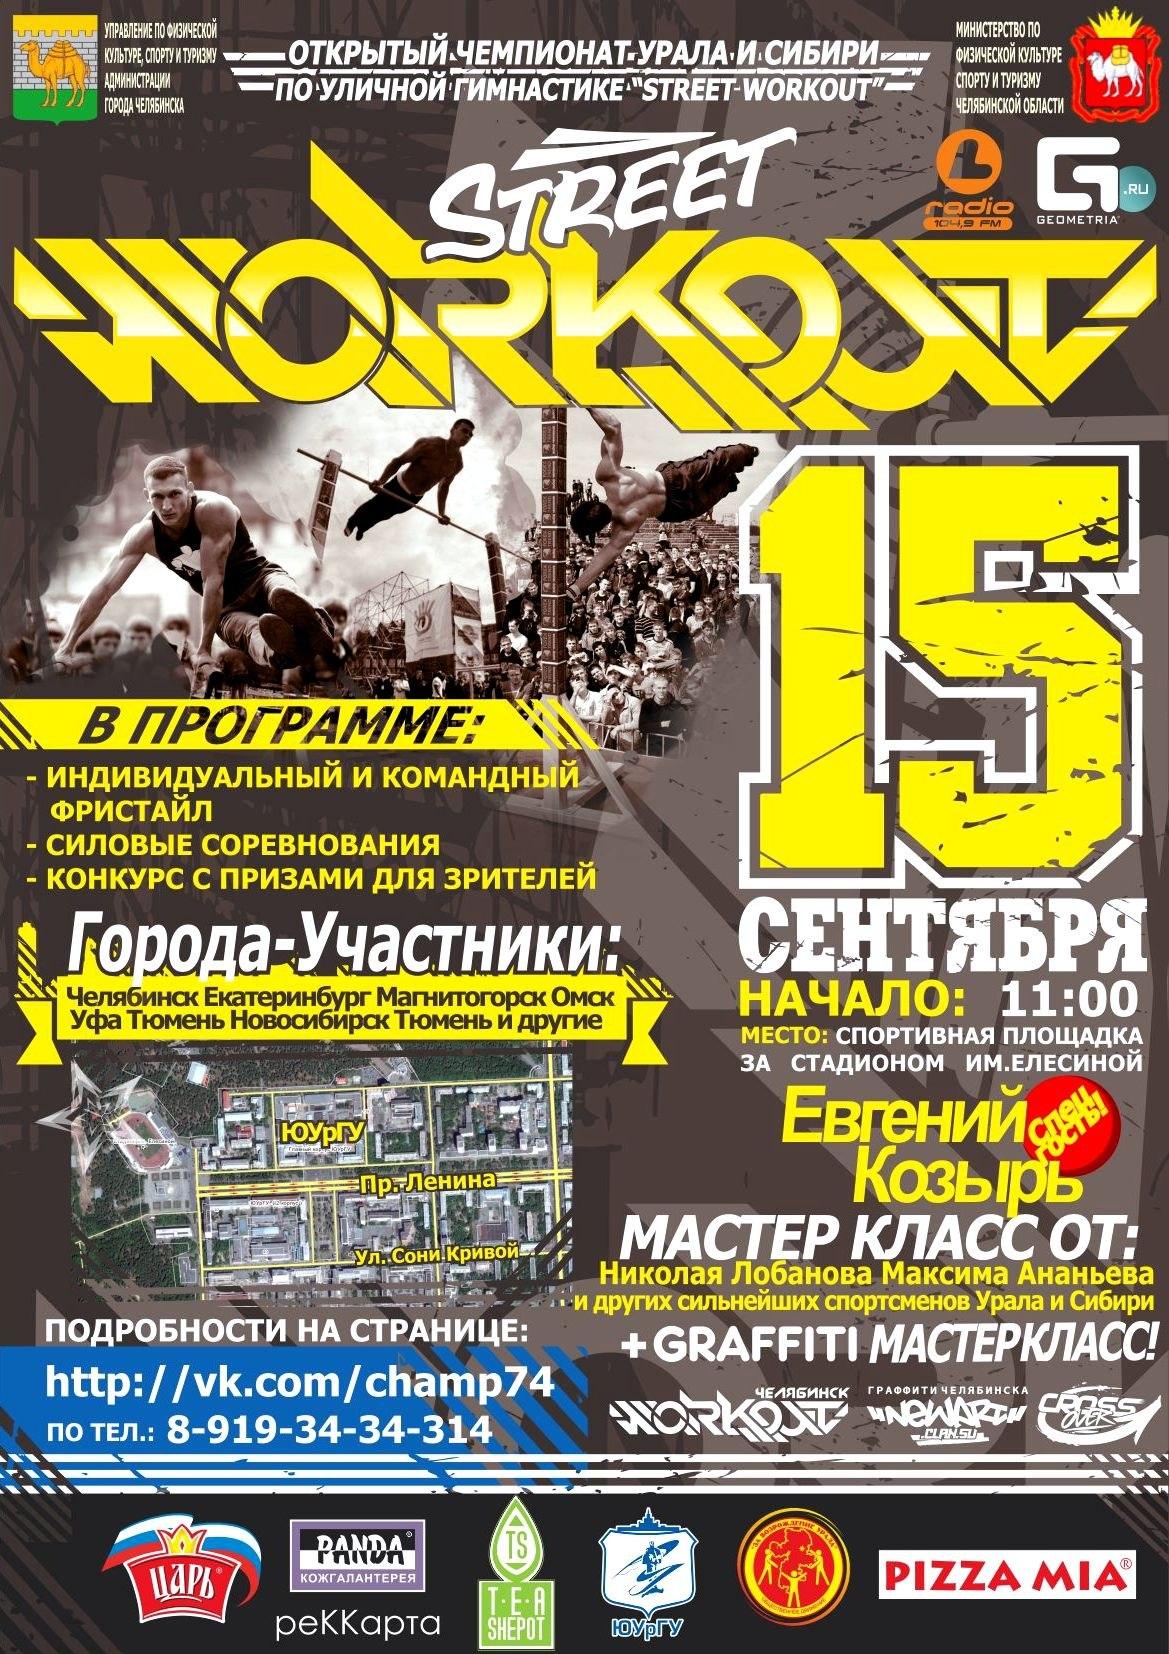 Открытый чемпионат Урала и Сибири по Street Workout